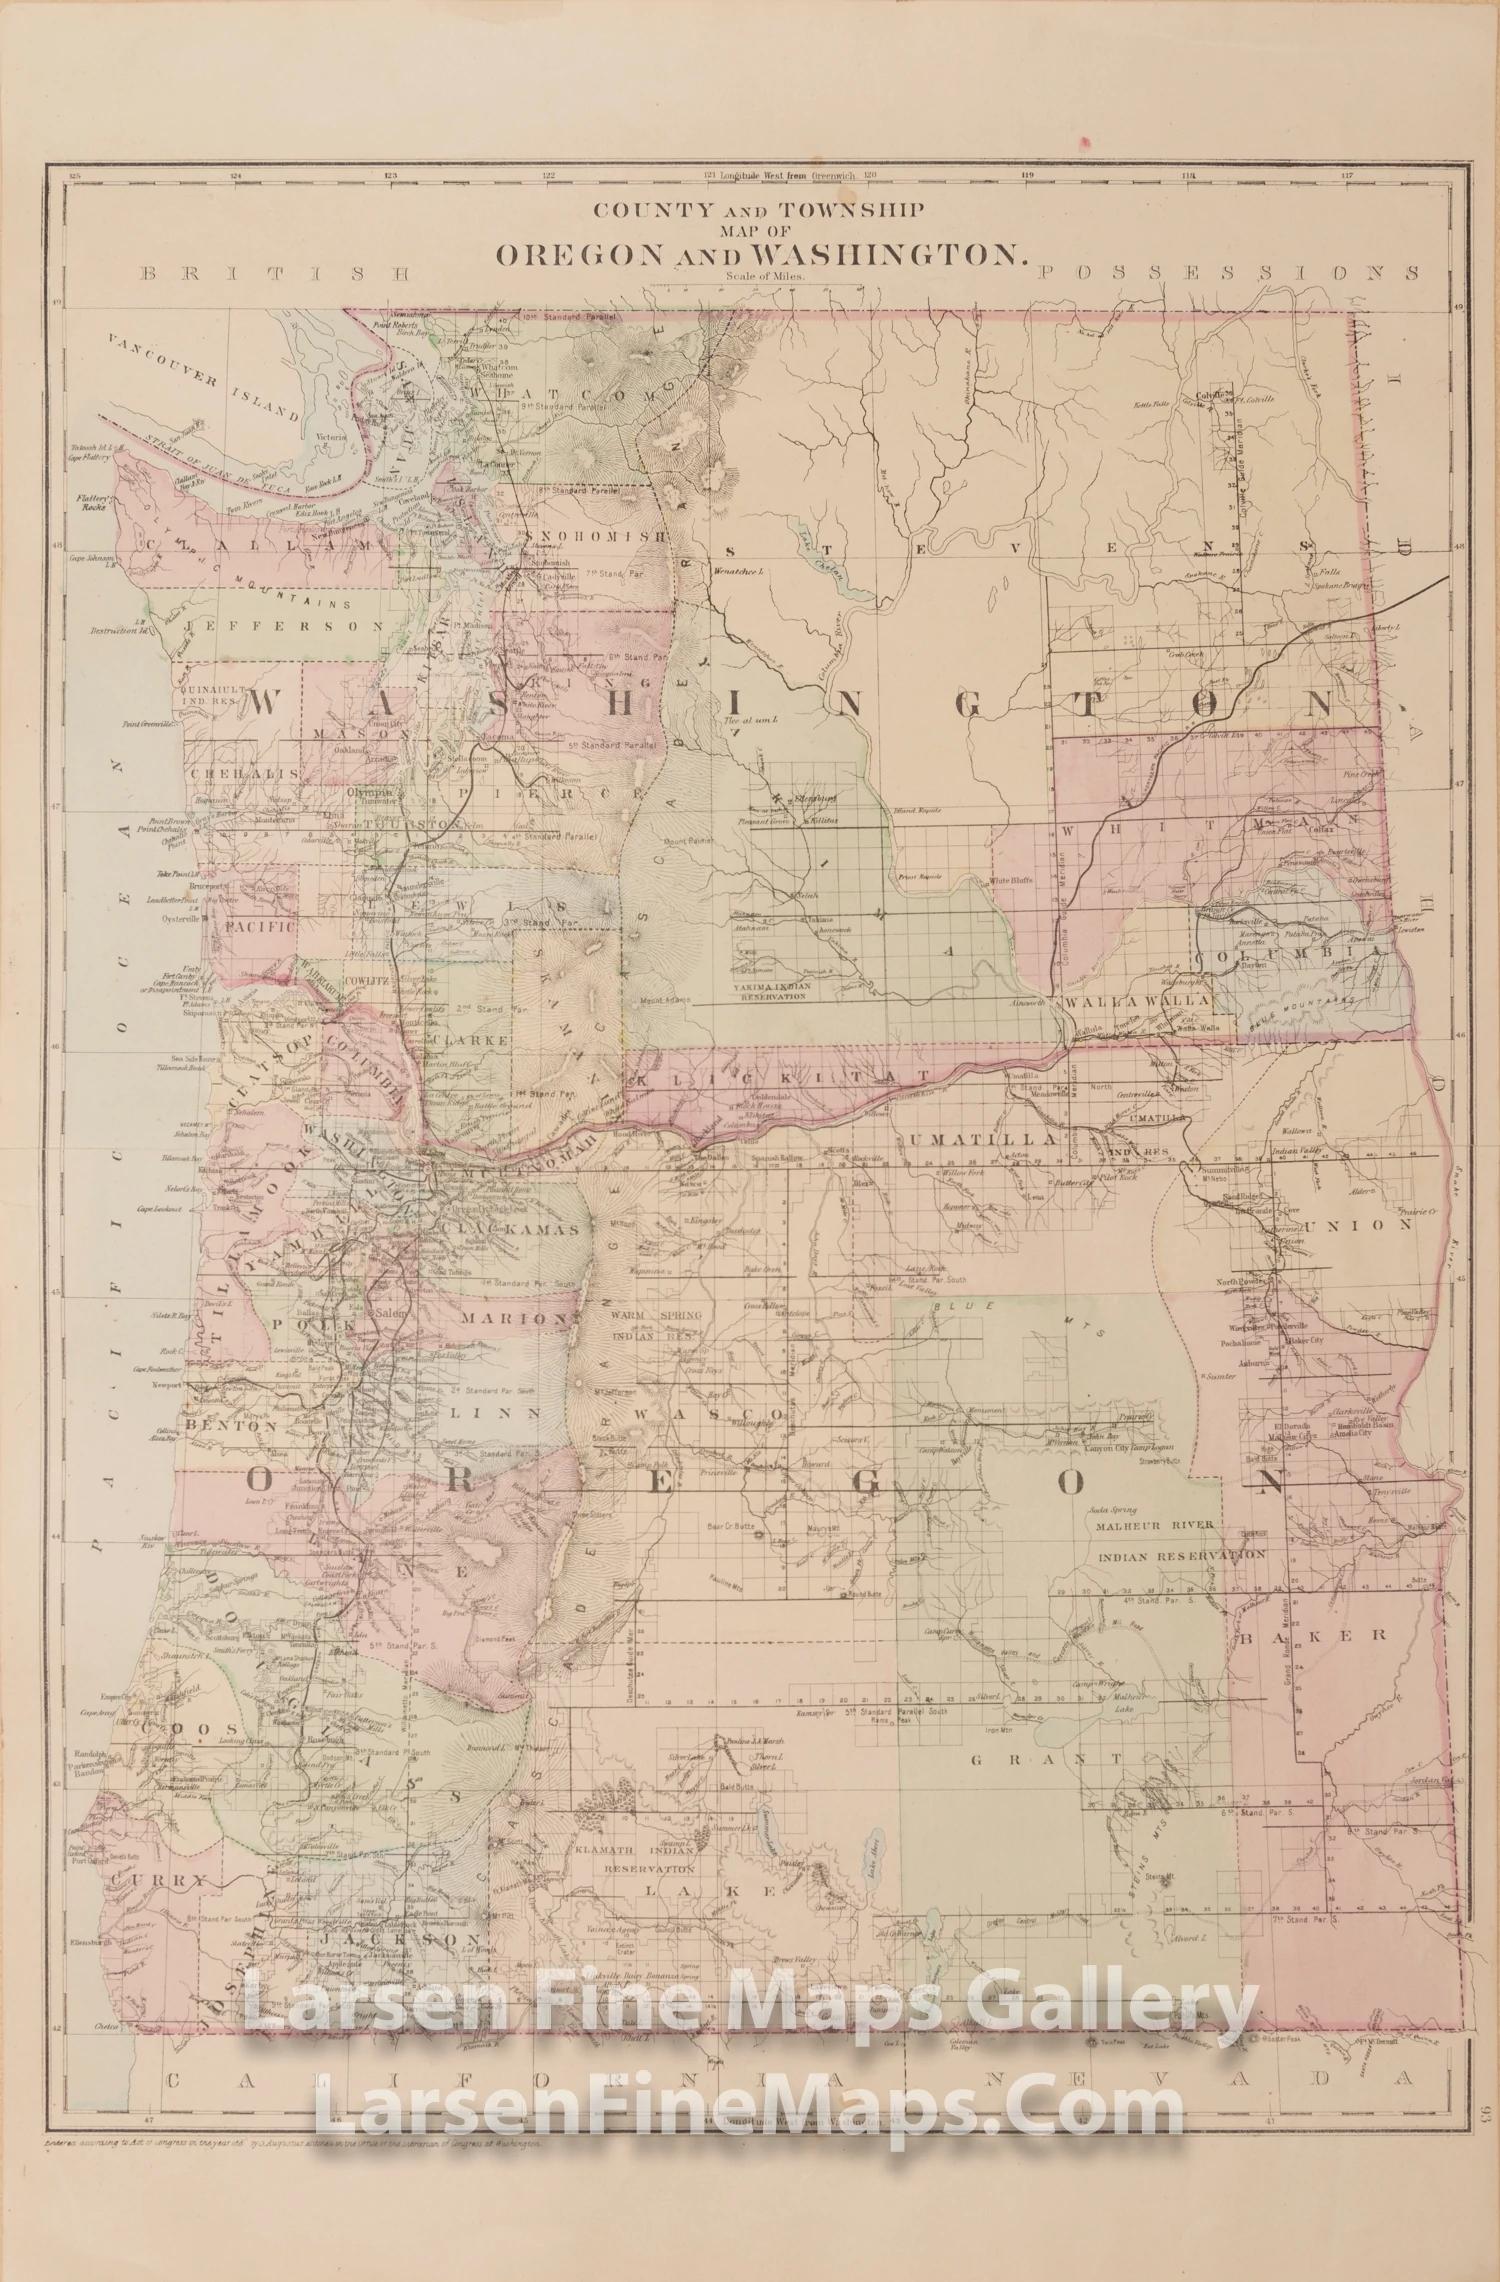 1881 E ROBINSON SHORT HILLS MILLBURN TOWNSHIP ESSEX COUNTY NEW JERSEY ATLAS MAP